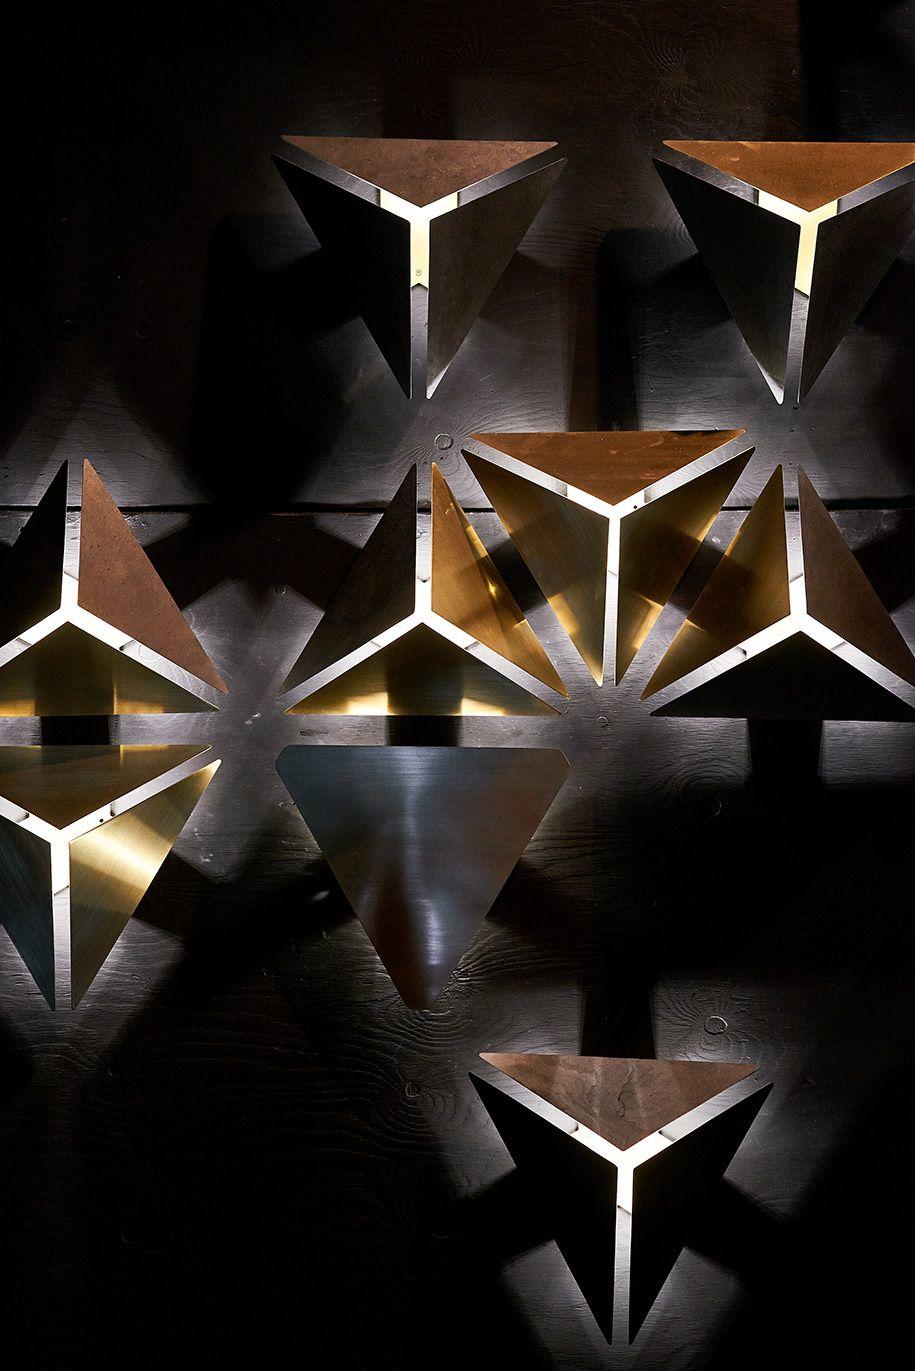 Adesignstudio garden of lights lighting pinterest lights